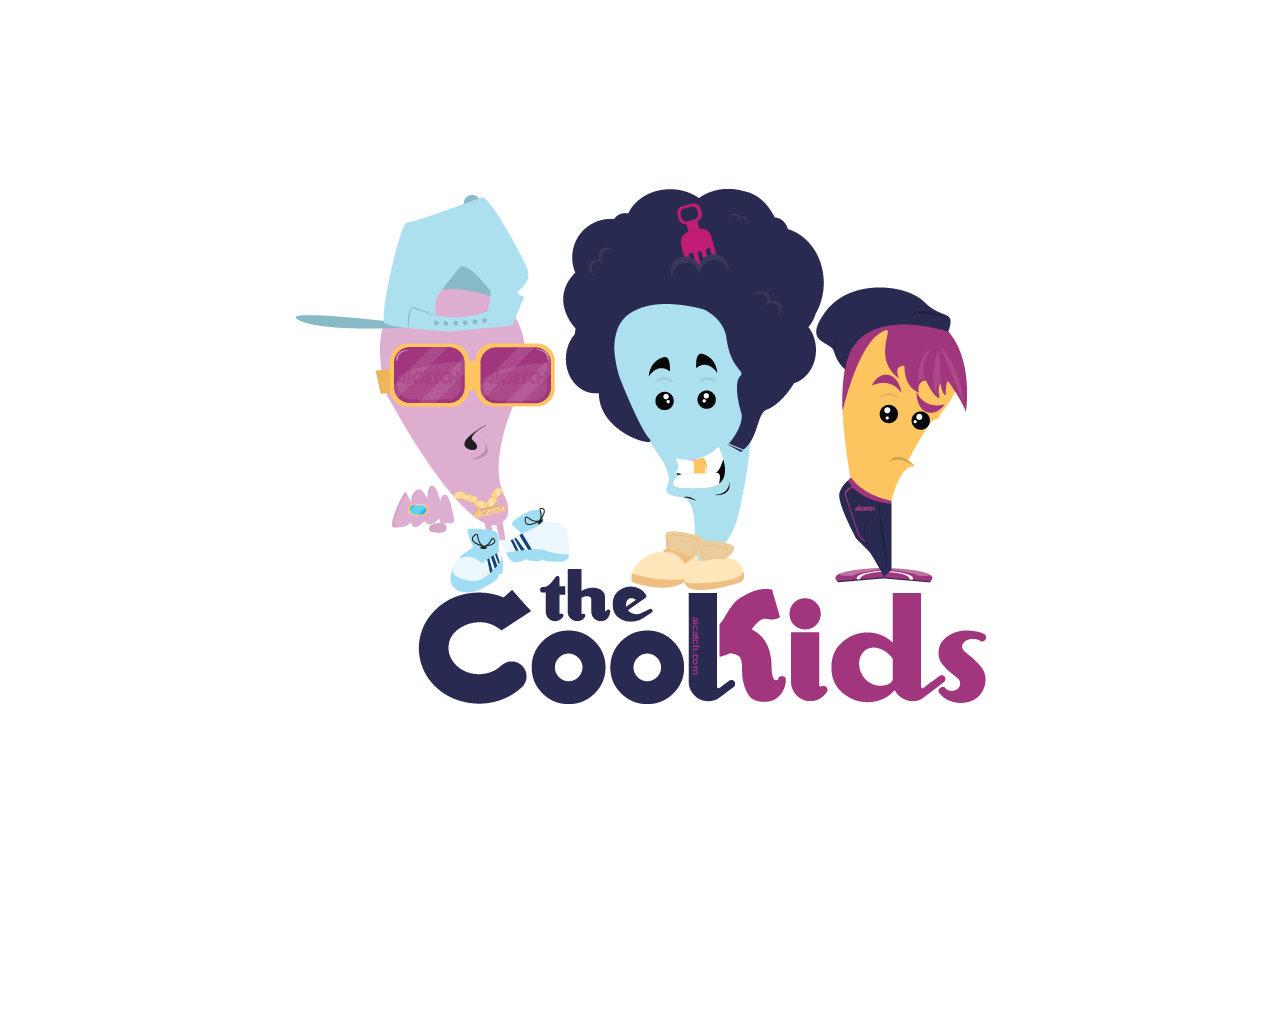 the Cool Kids by Msch 1280x1024